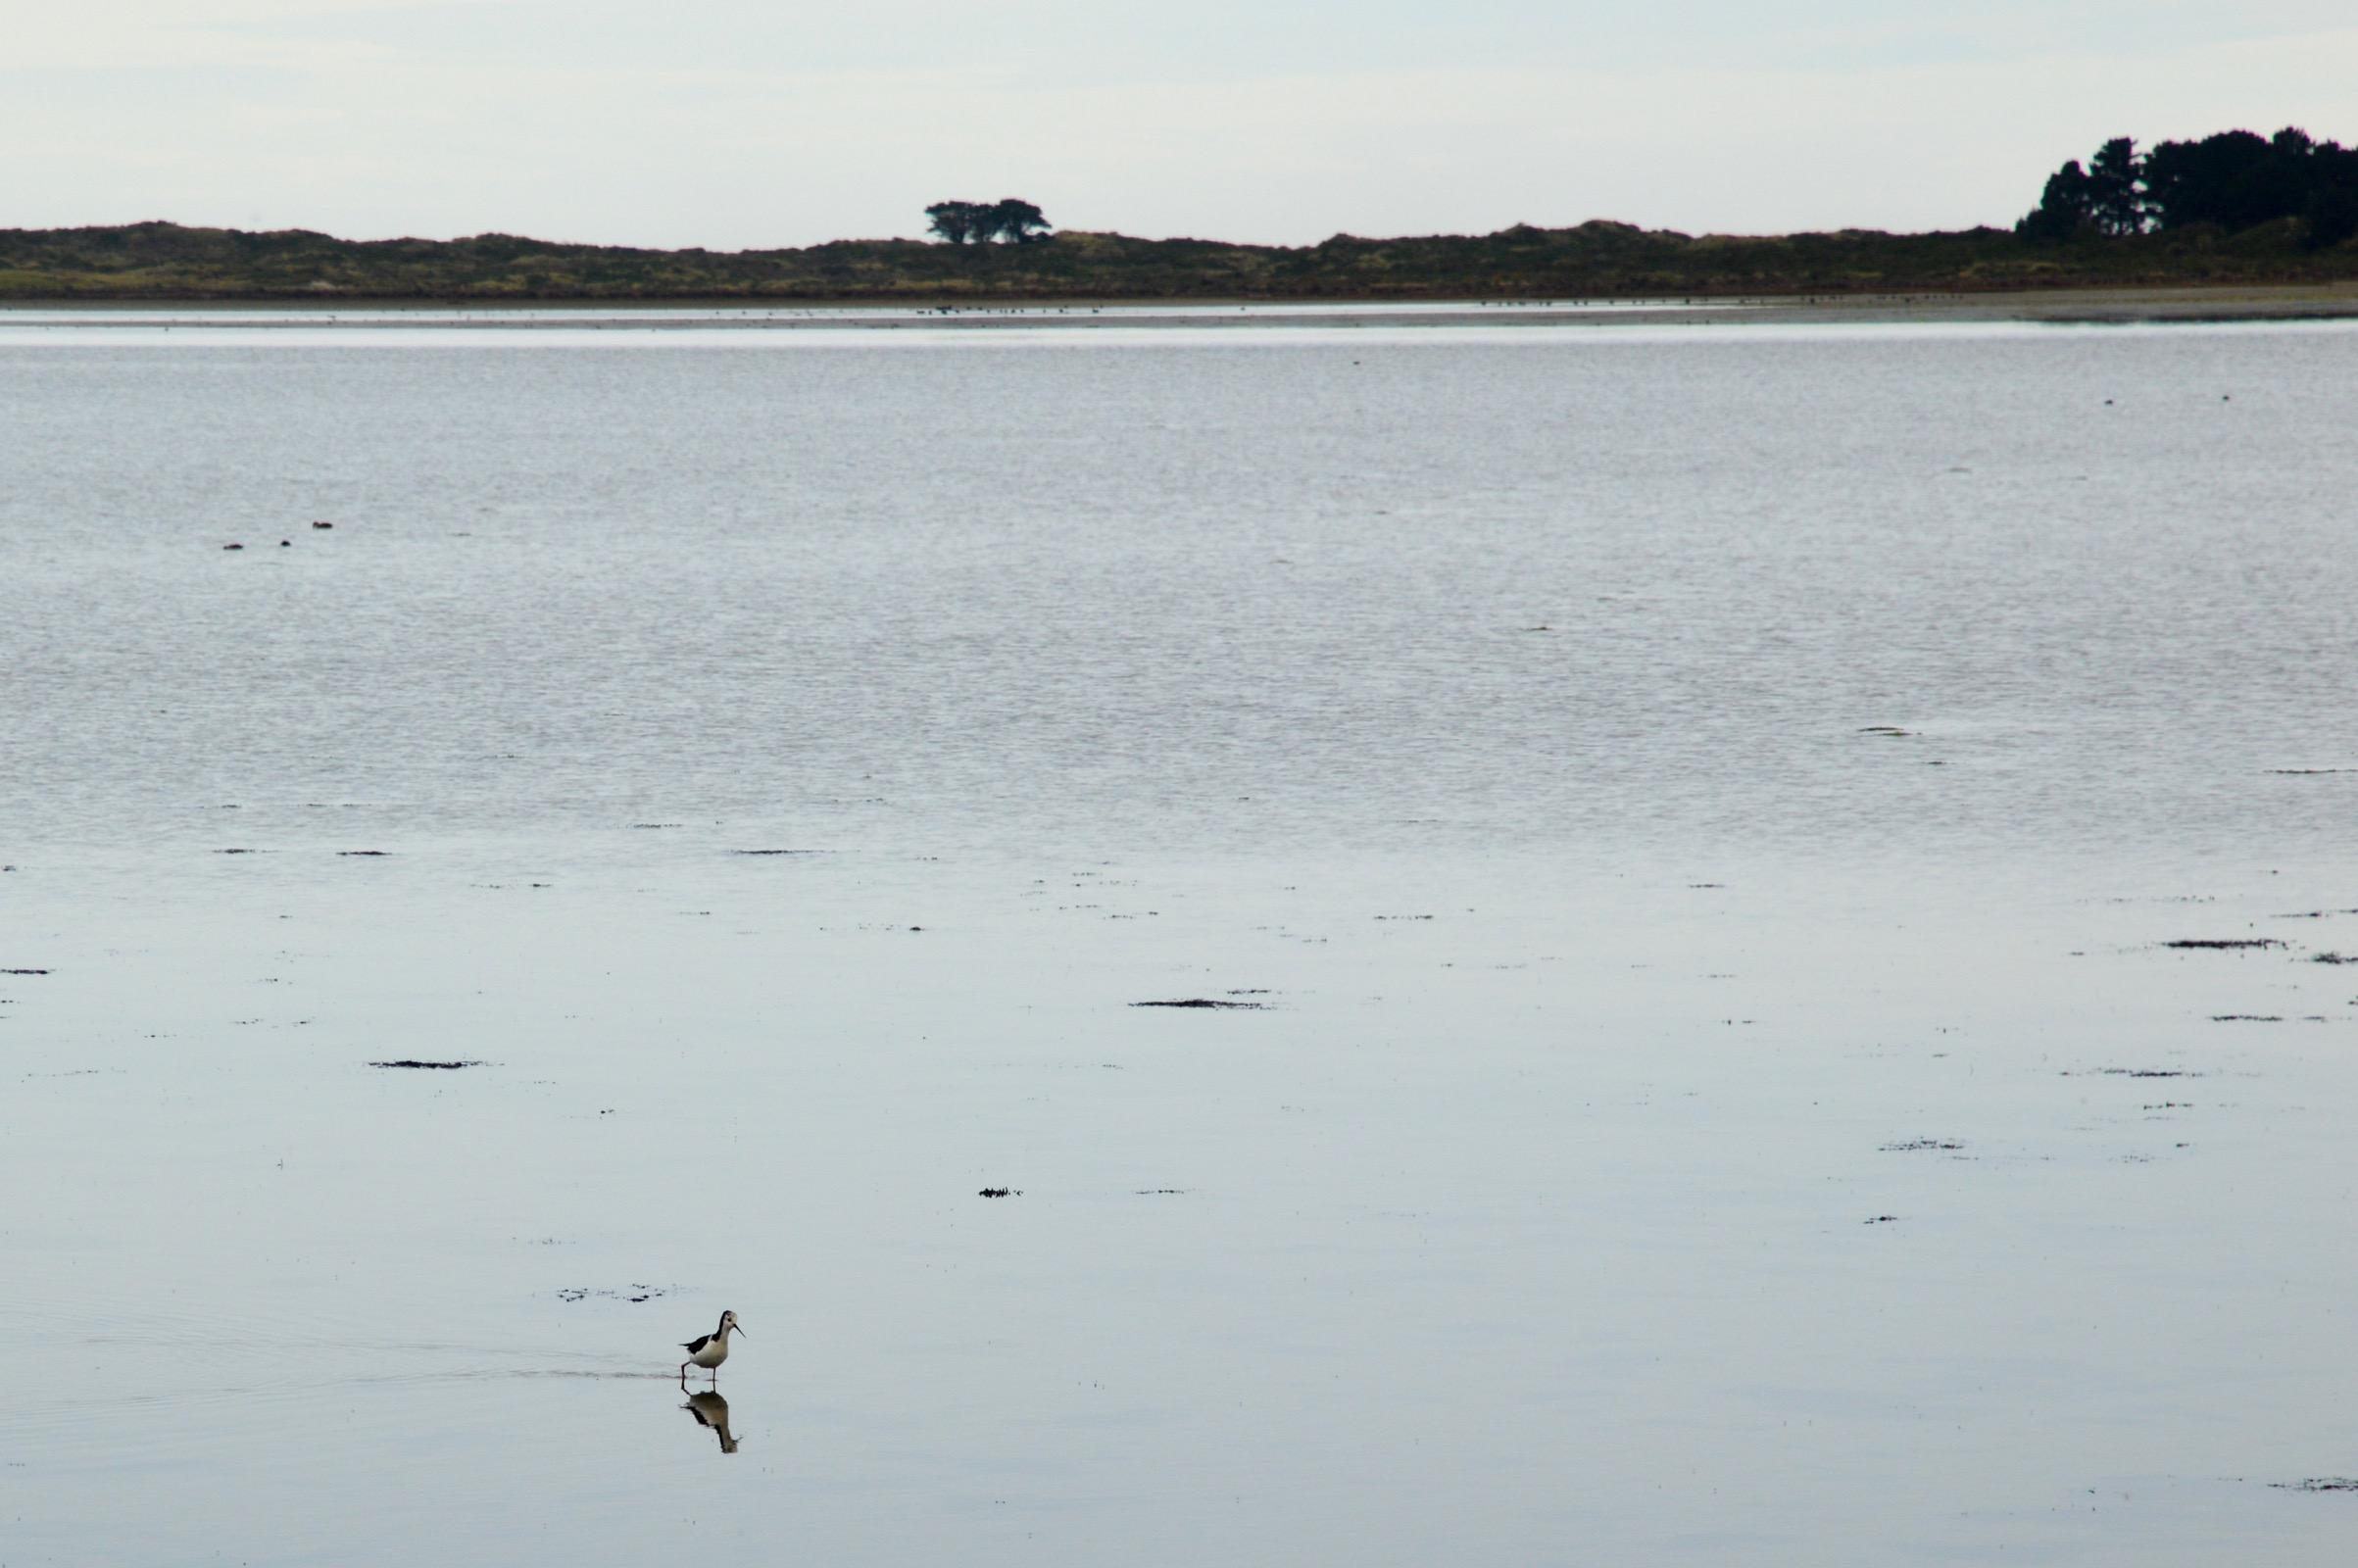 Bird walking on water on the Otago Peninsula, New Zealand